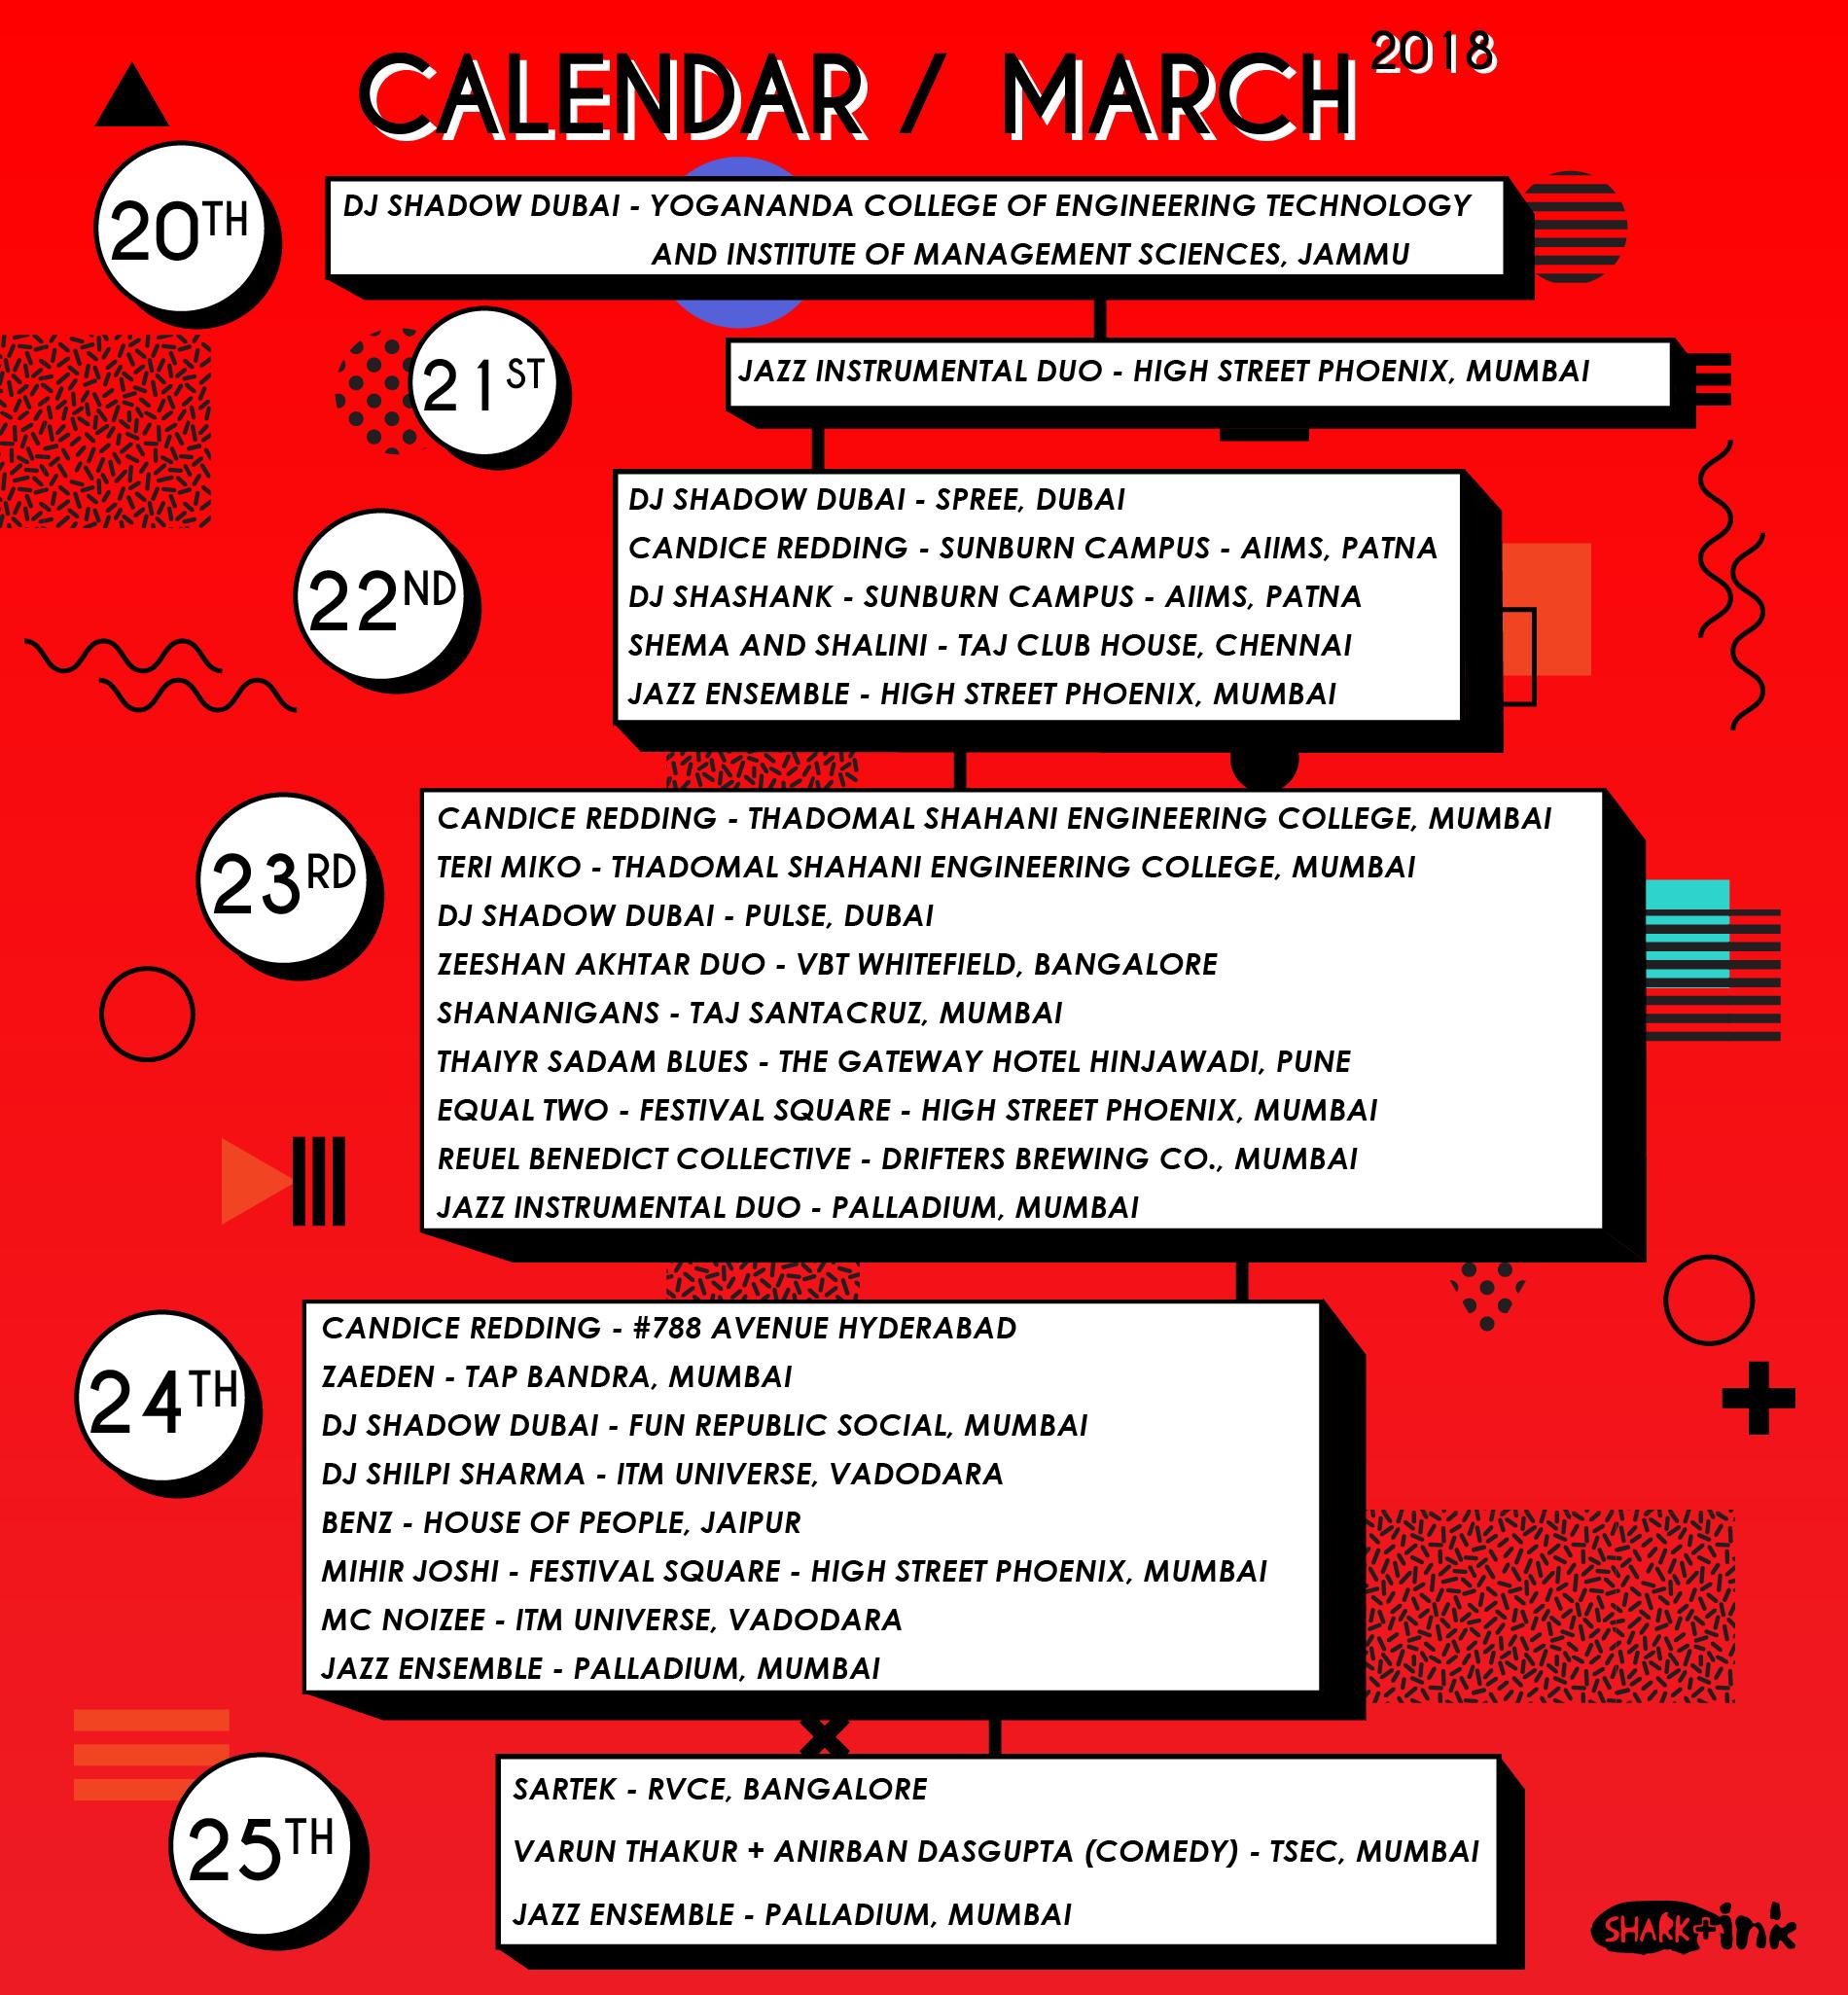 calendar march-03.png